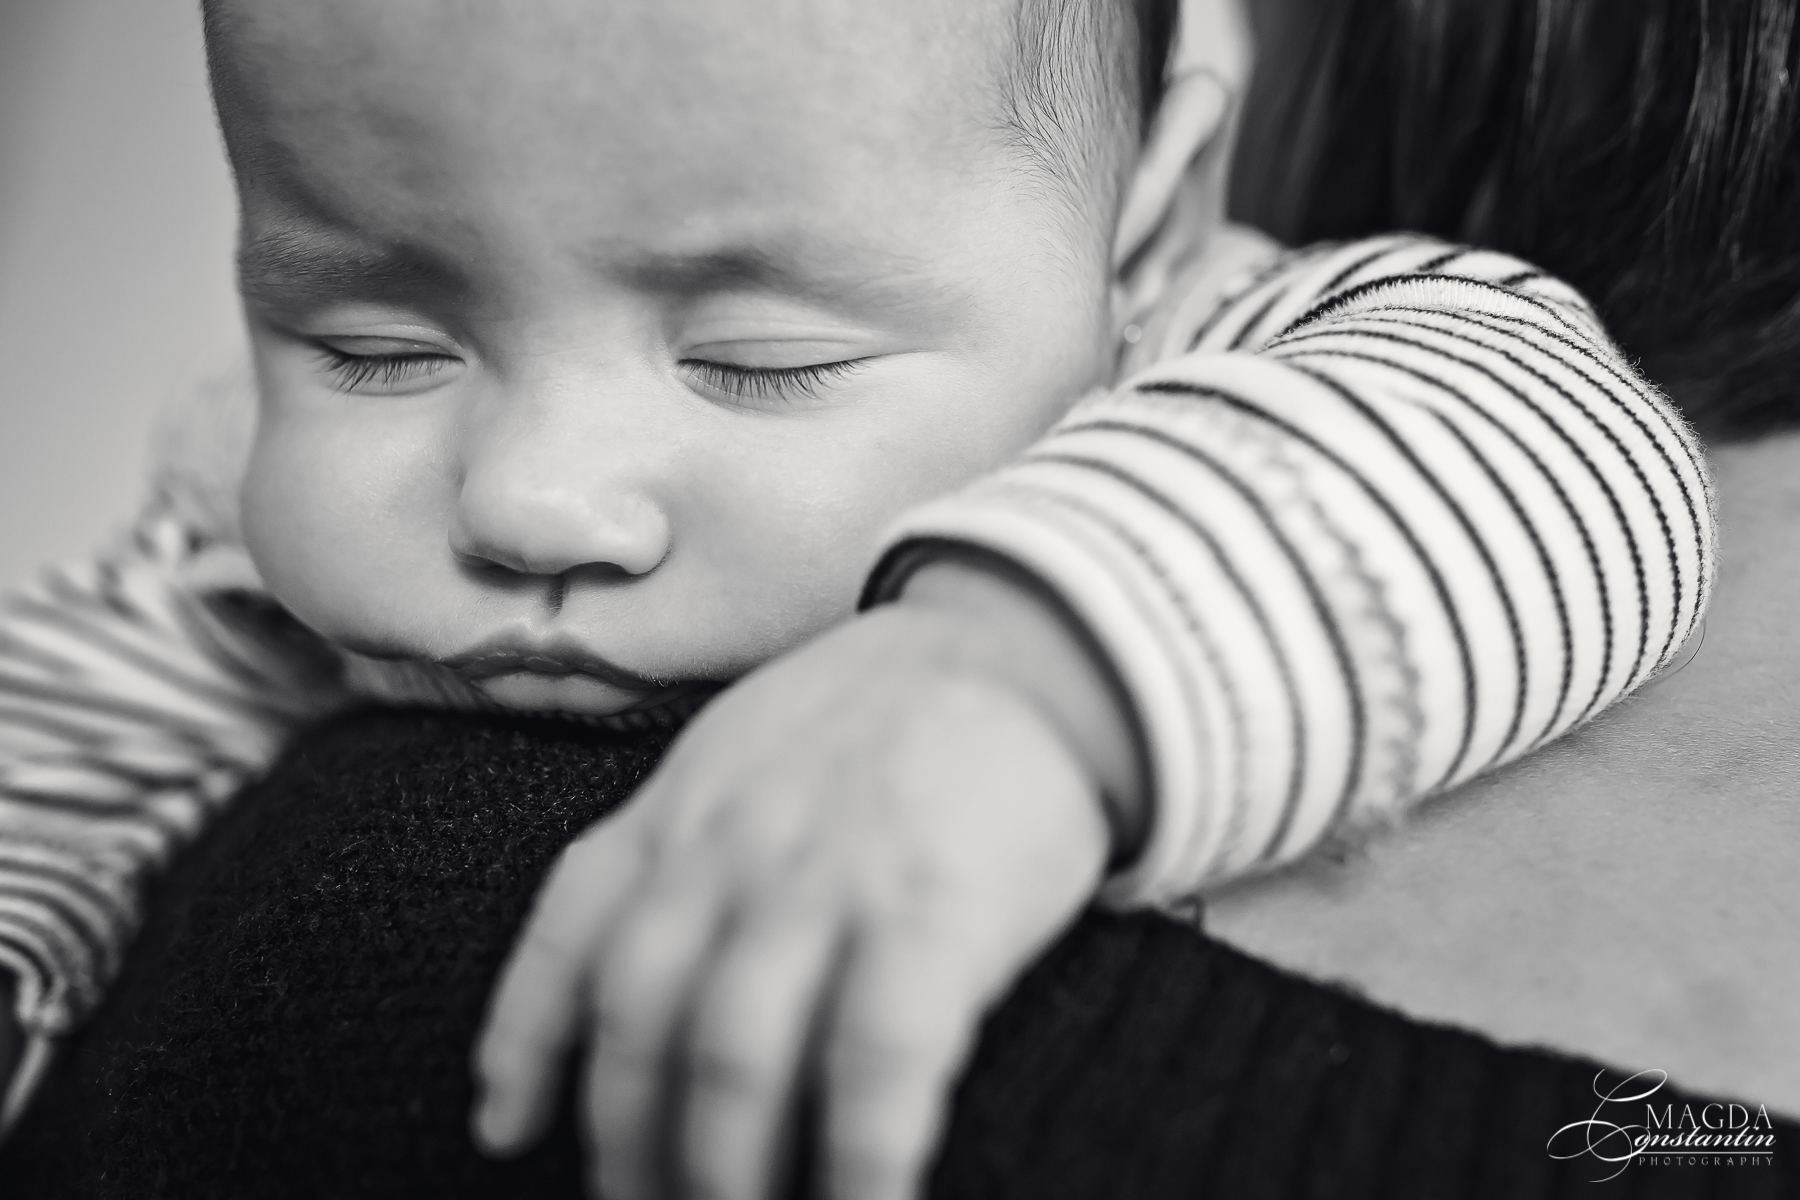 Fotograf la botezul mariei sedinta foto acasa pe umarul mamei detaliu gene alb negru